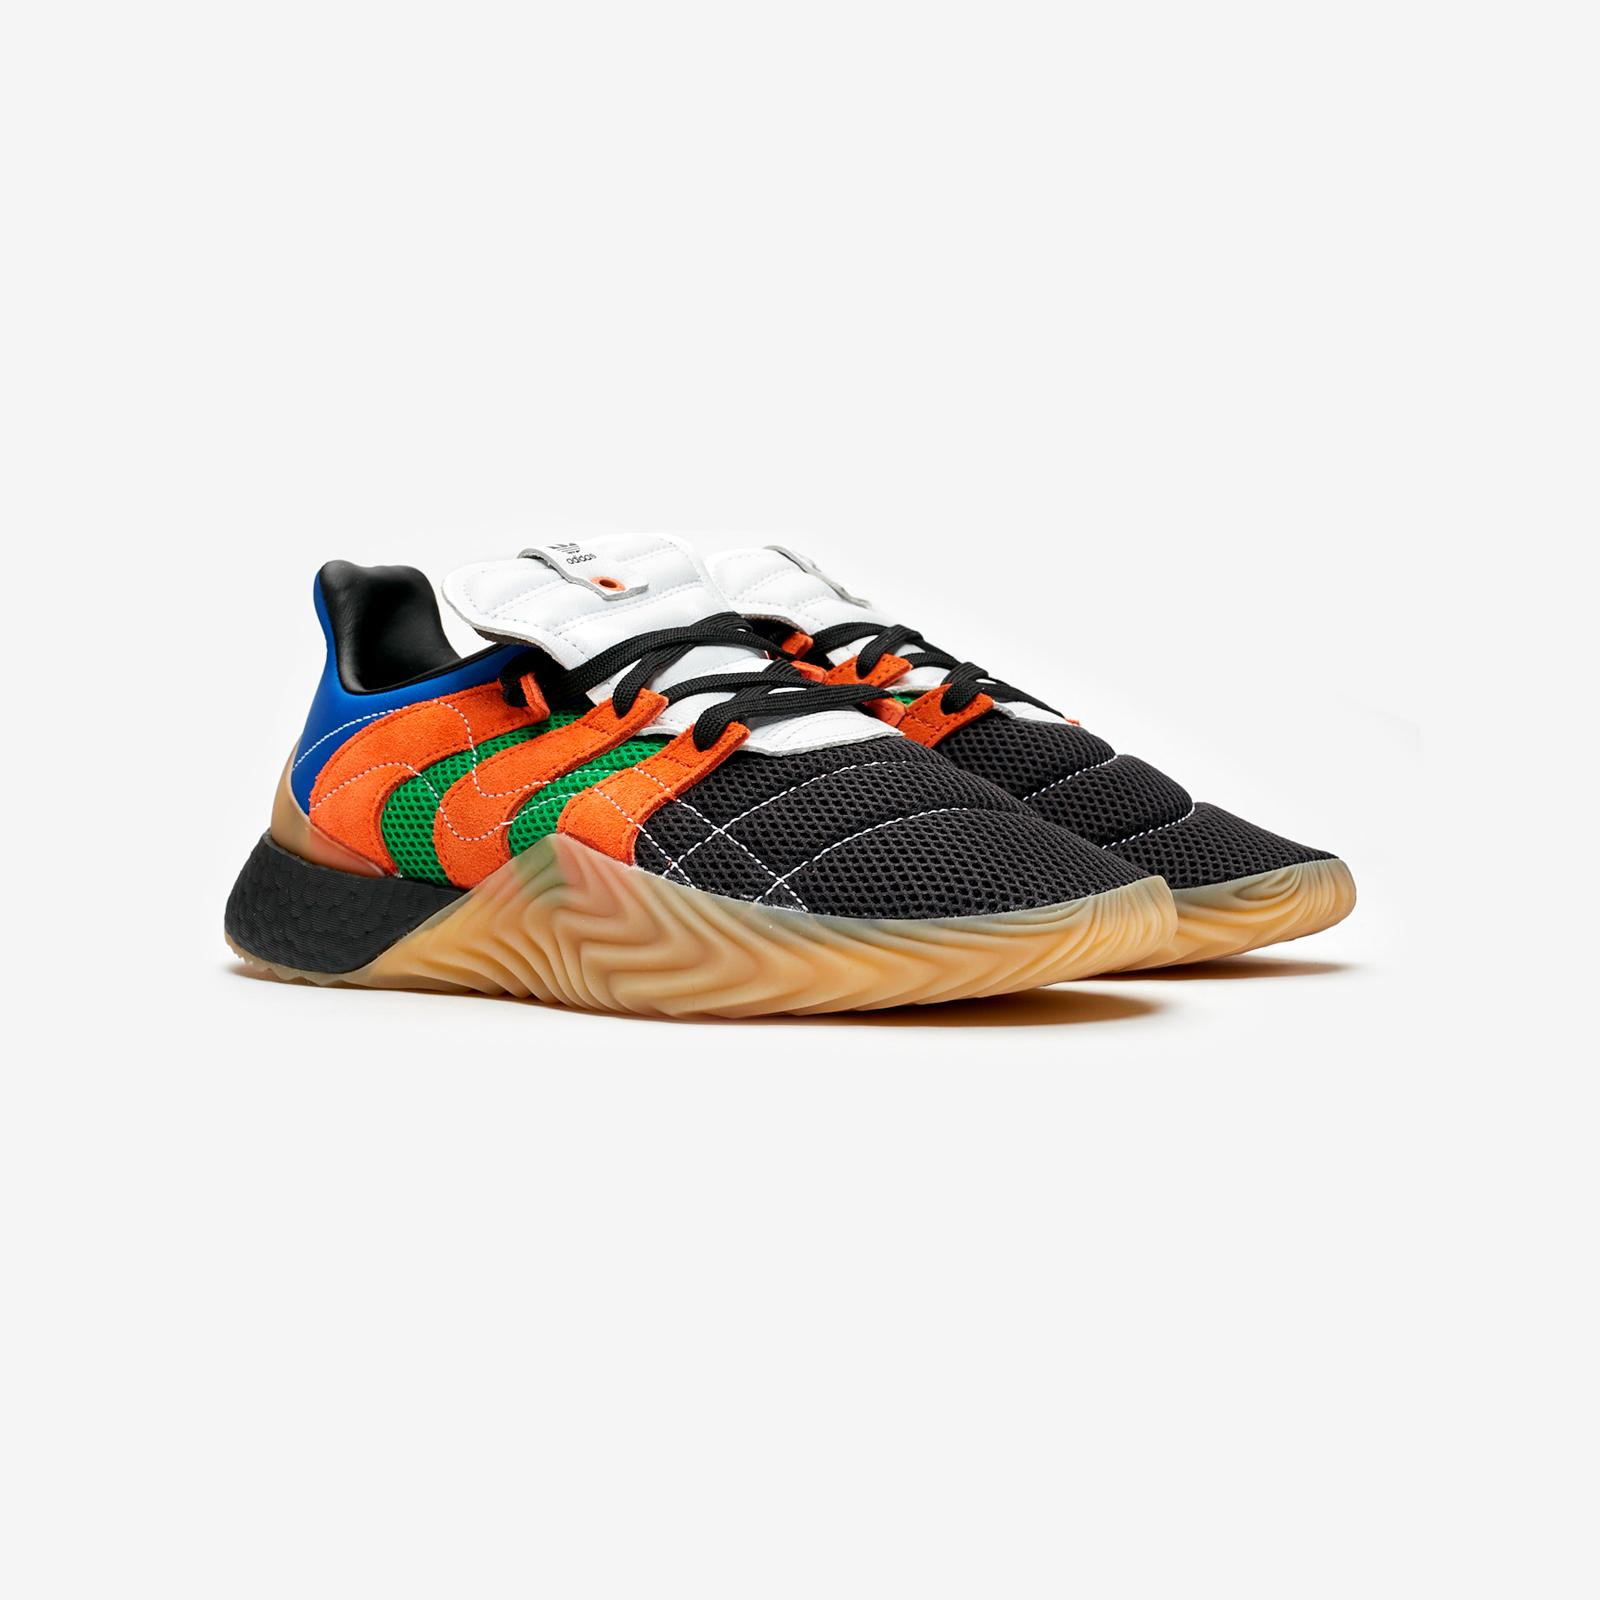 soltar expedición ballena  adidas Sobakov Boost SVD - G26281 - Sneakersnstuff | sneakers & streetwear  online since 1999